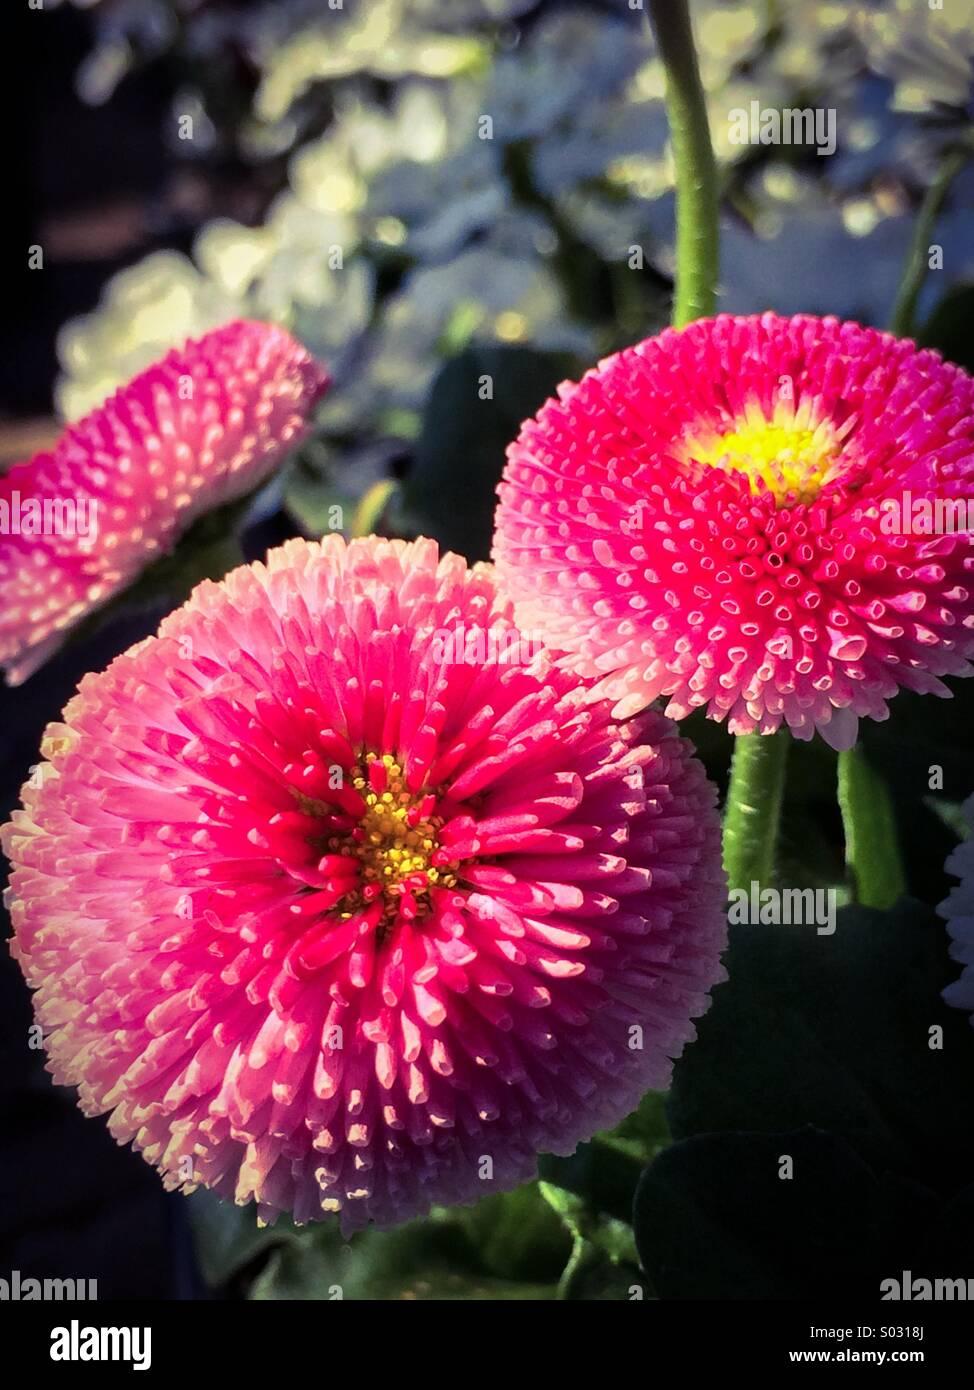 Magenta mums in a botanical garden Stock Photo